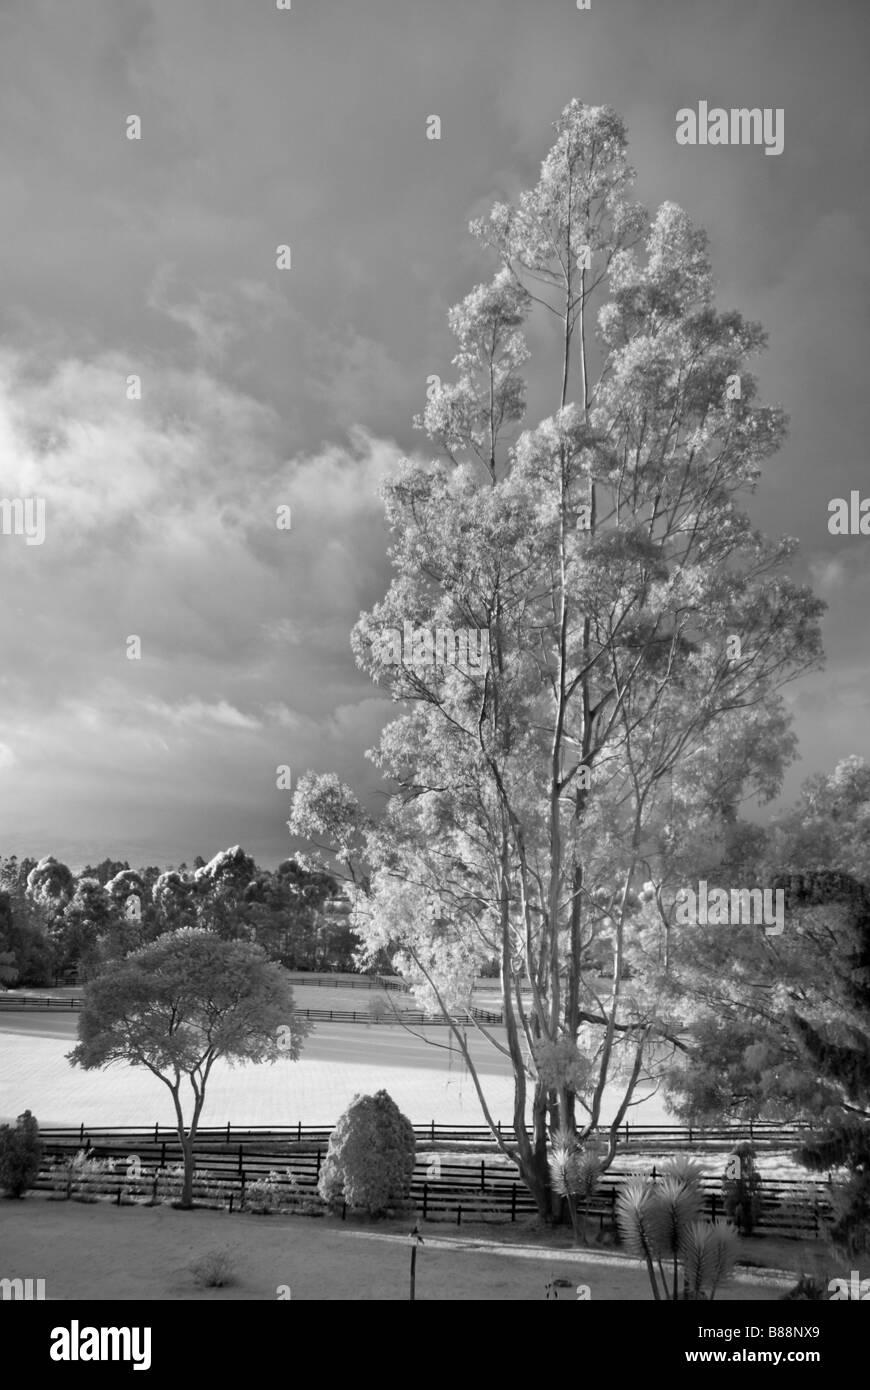 Eucalyptus tree and polo grounds la Sabana near Bogota Colombia - Stock Image